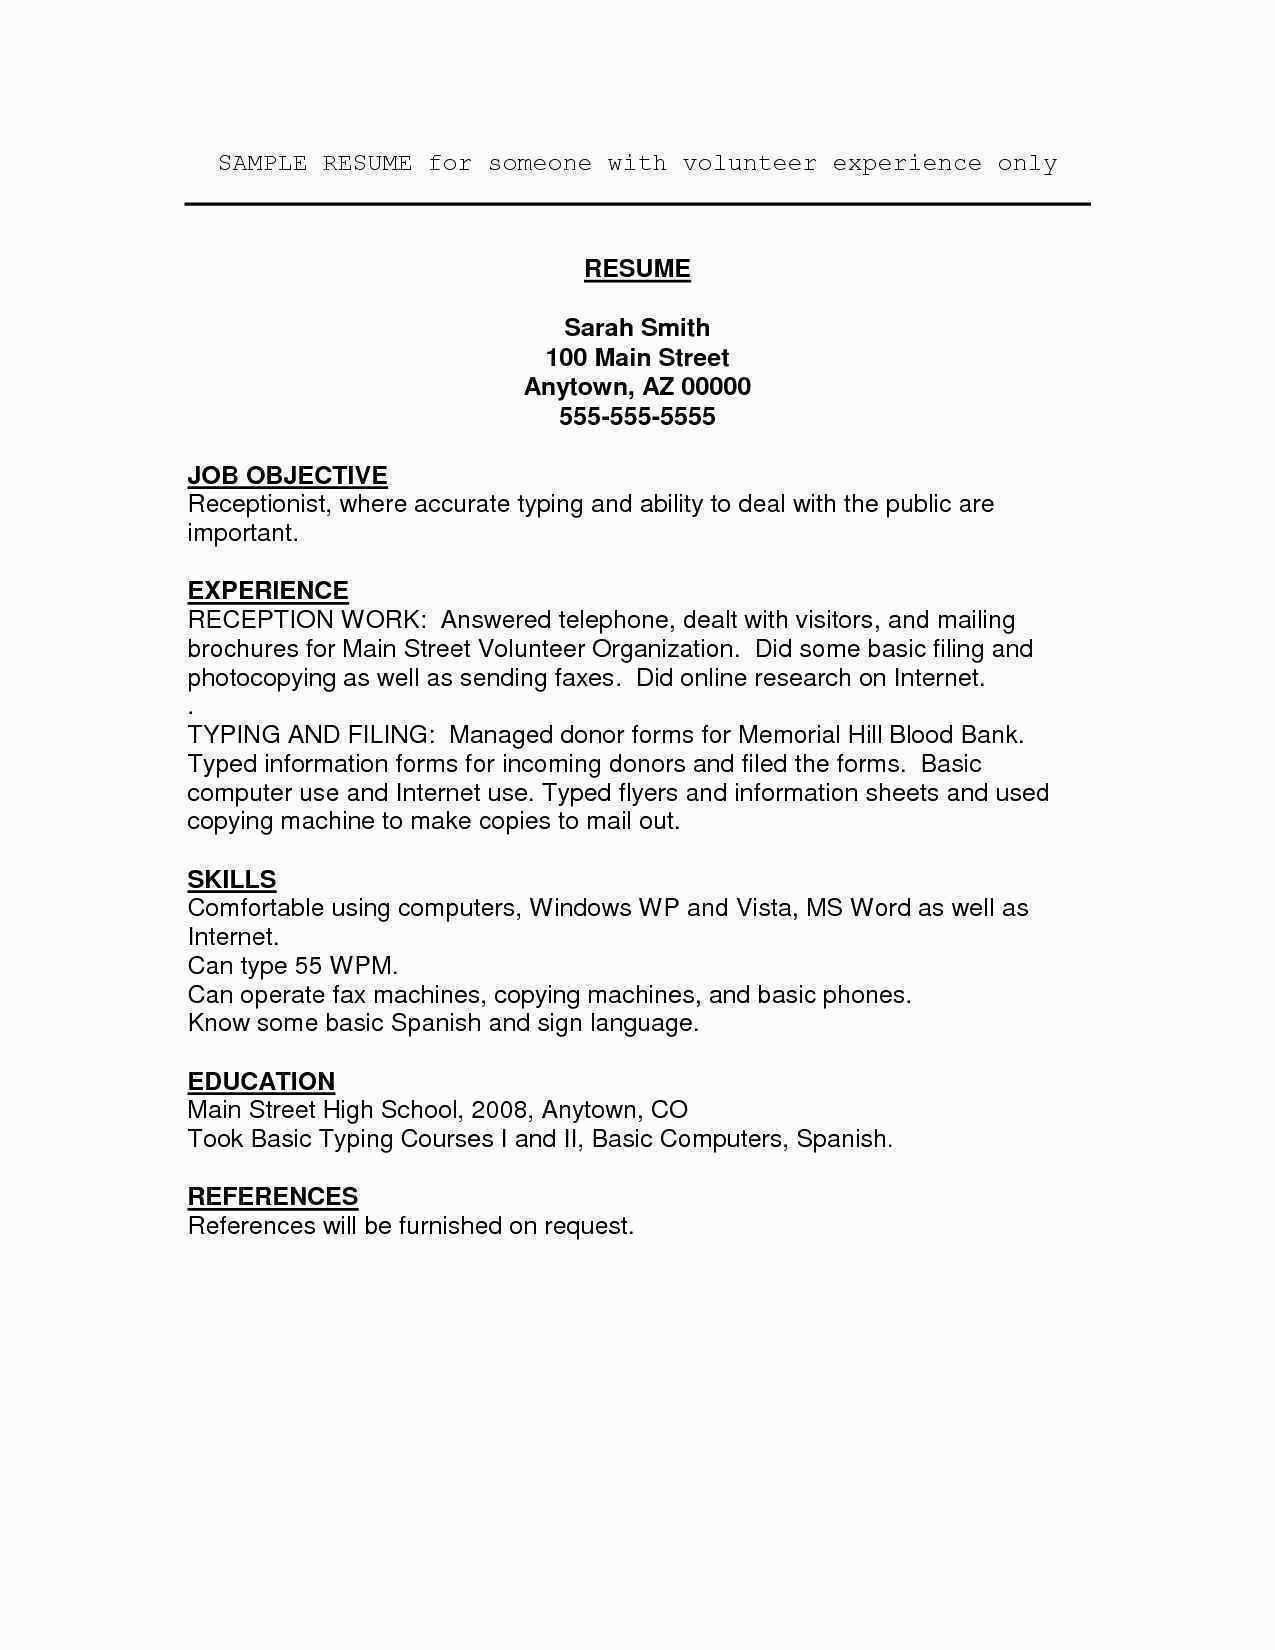 Student athlete Resume Template 70 Luxury S Sample Resume for High School Student